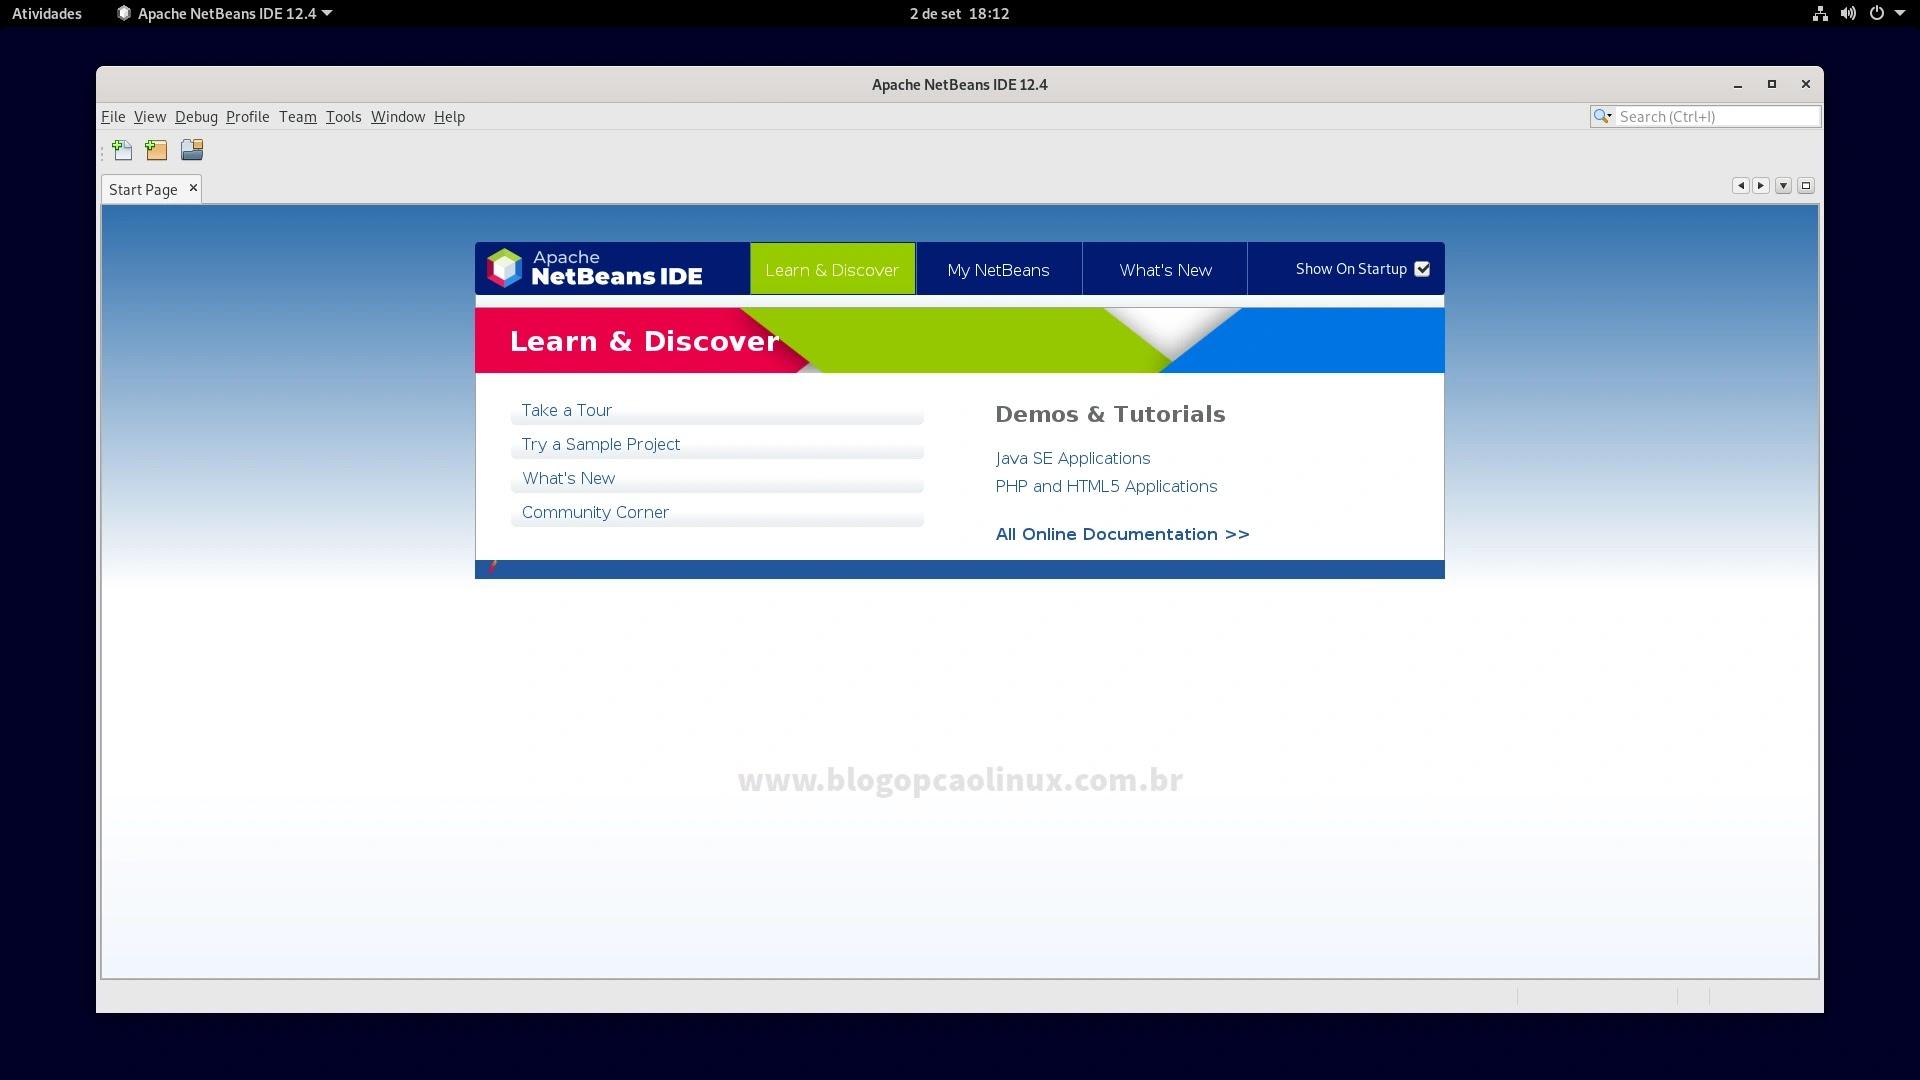 Apache NetBeans IDE 12.4 executando no Debian 11 Bullseye com desktop GNOME Shell